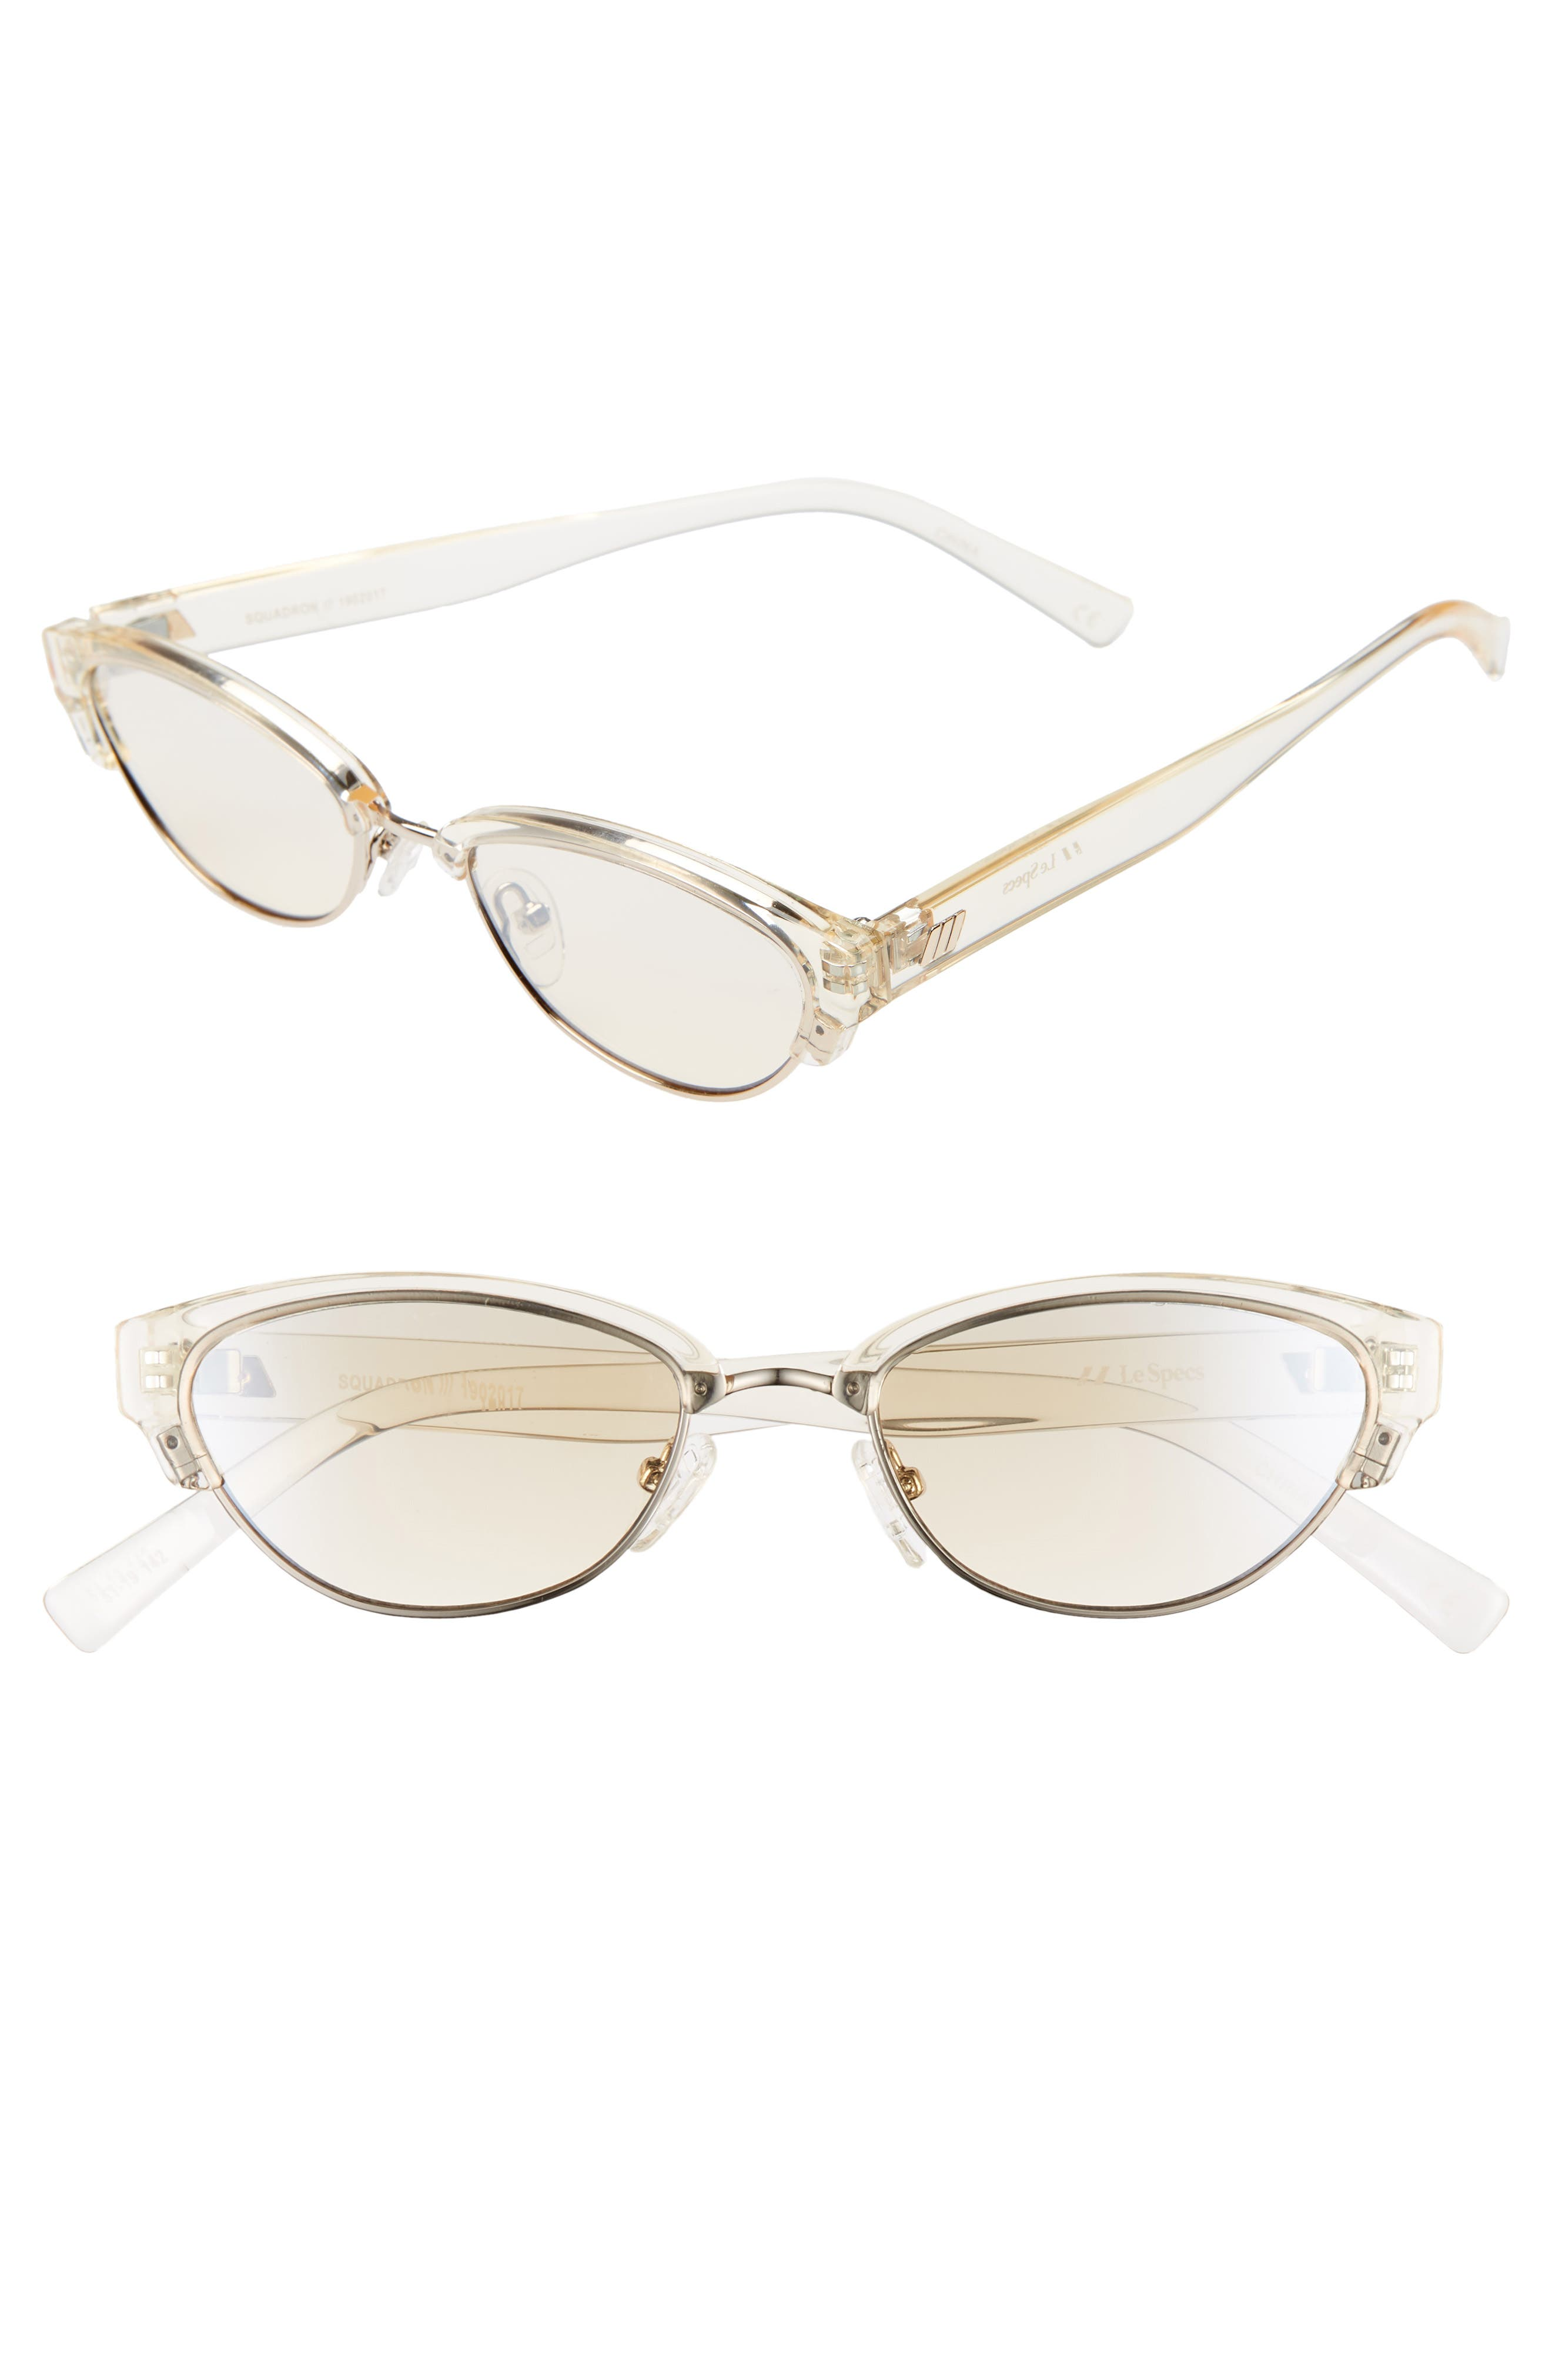 Le Specs Squadron 51Mm Brow Bar Sunglasses - Transparent Yuzu/ Champagne